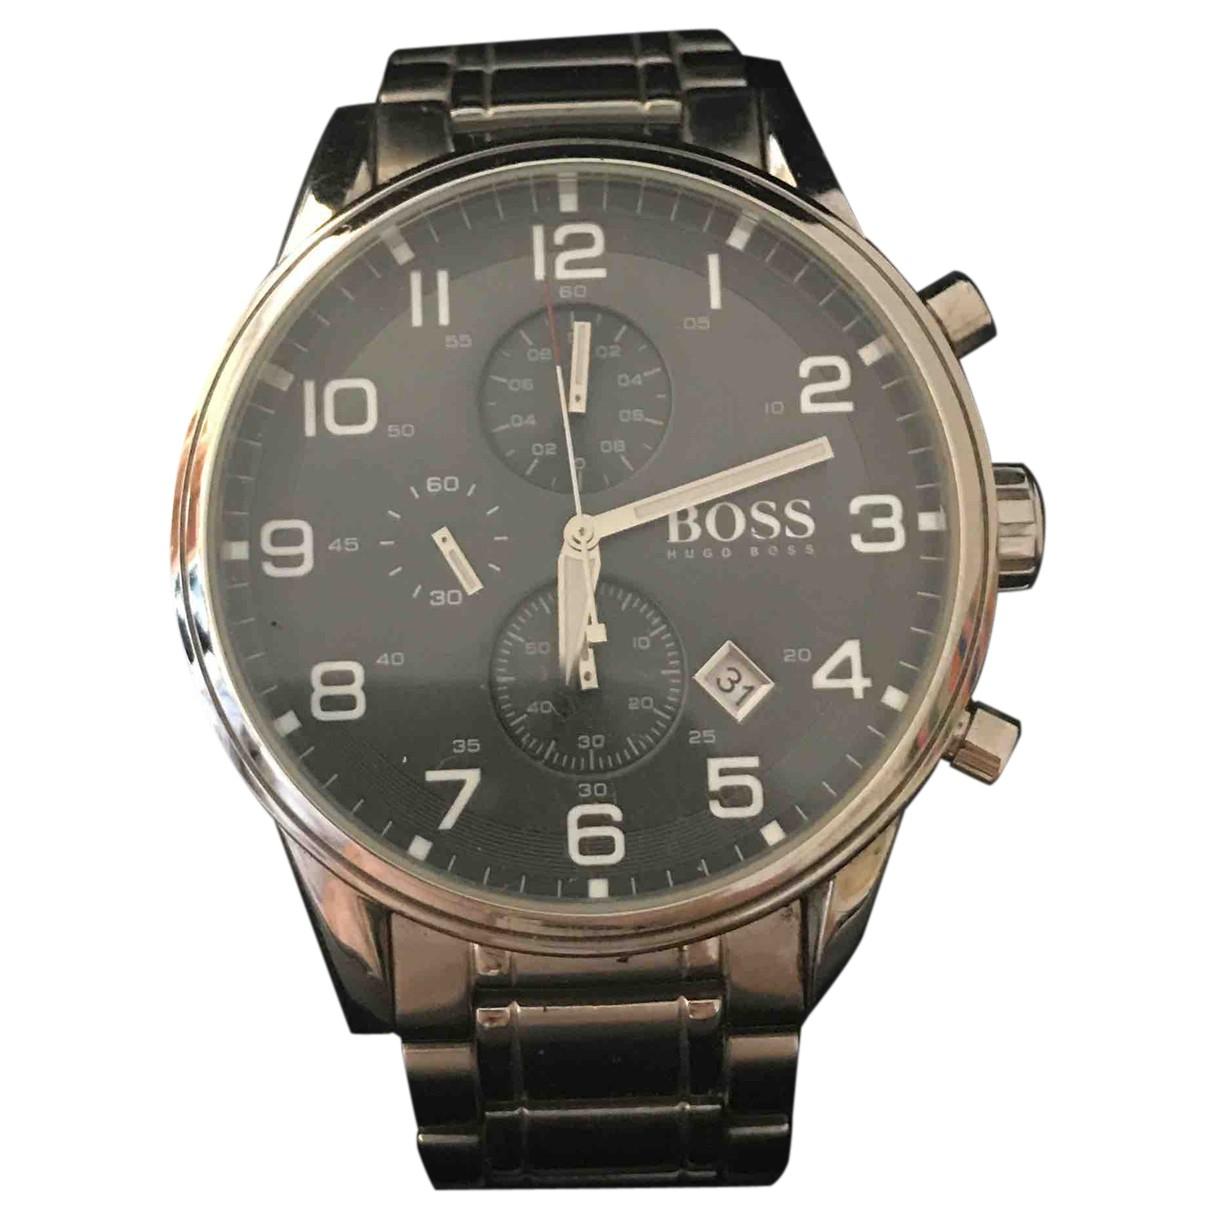 Relojes Boss